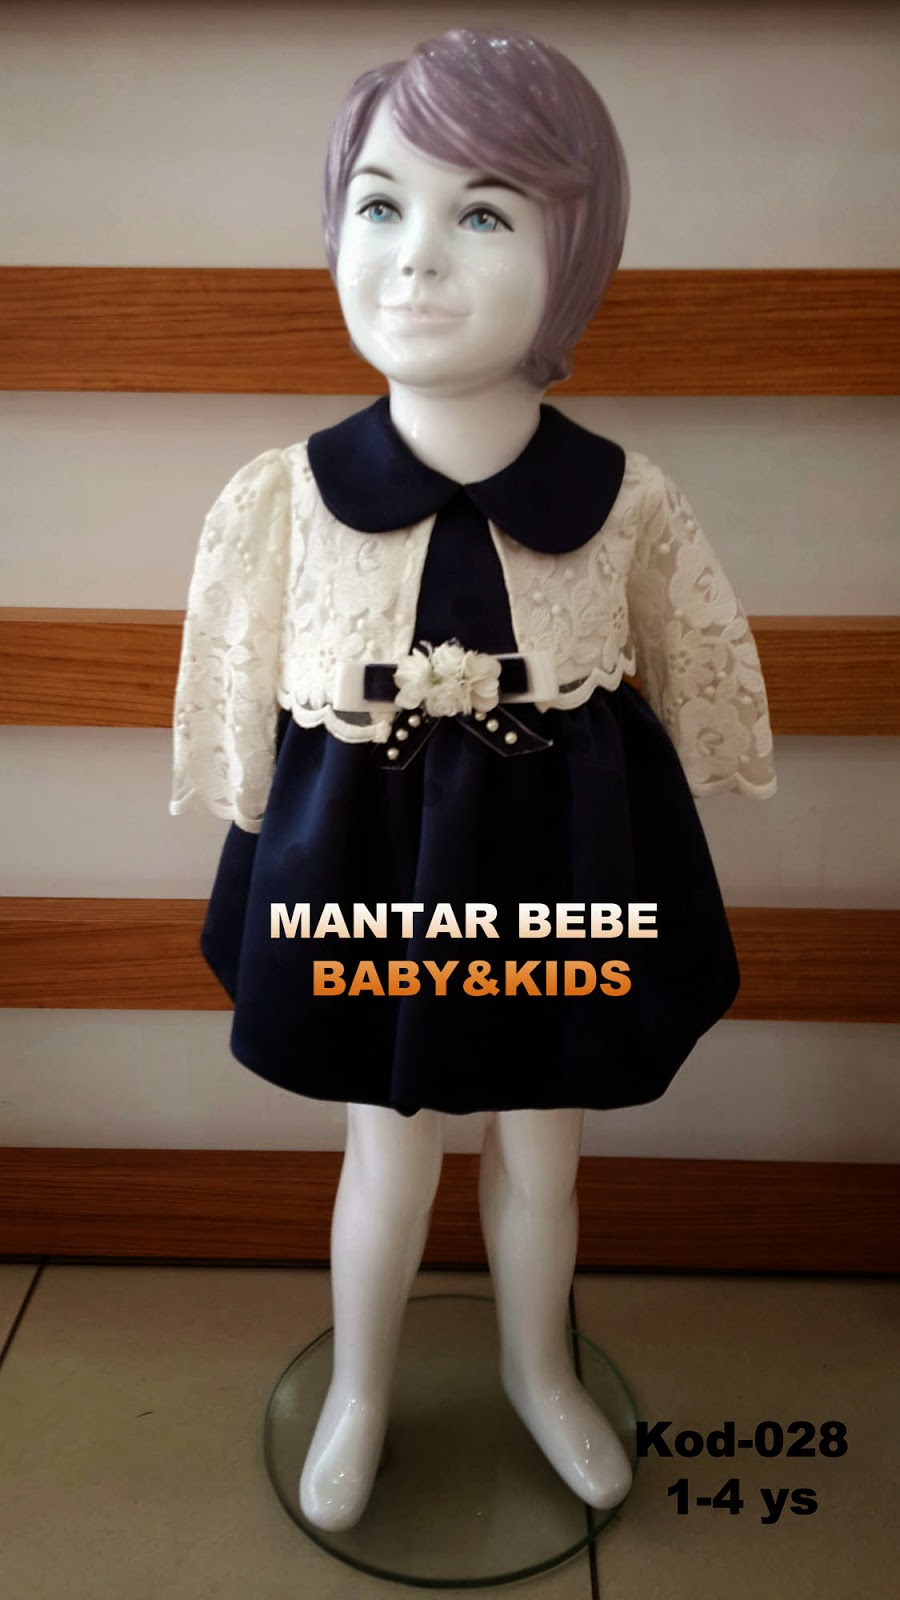 MANTAR BEBE ÇOCUK GİYİM - KOD028